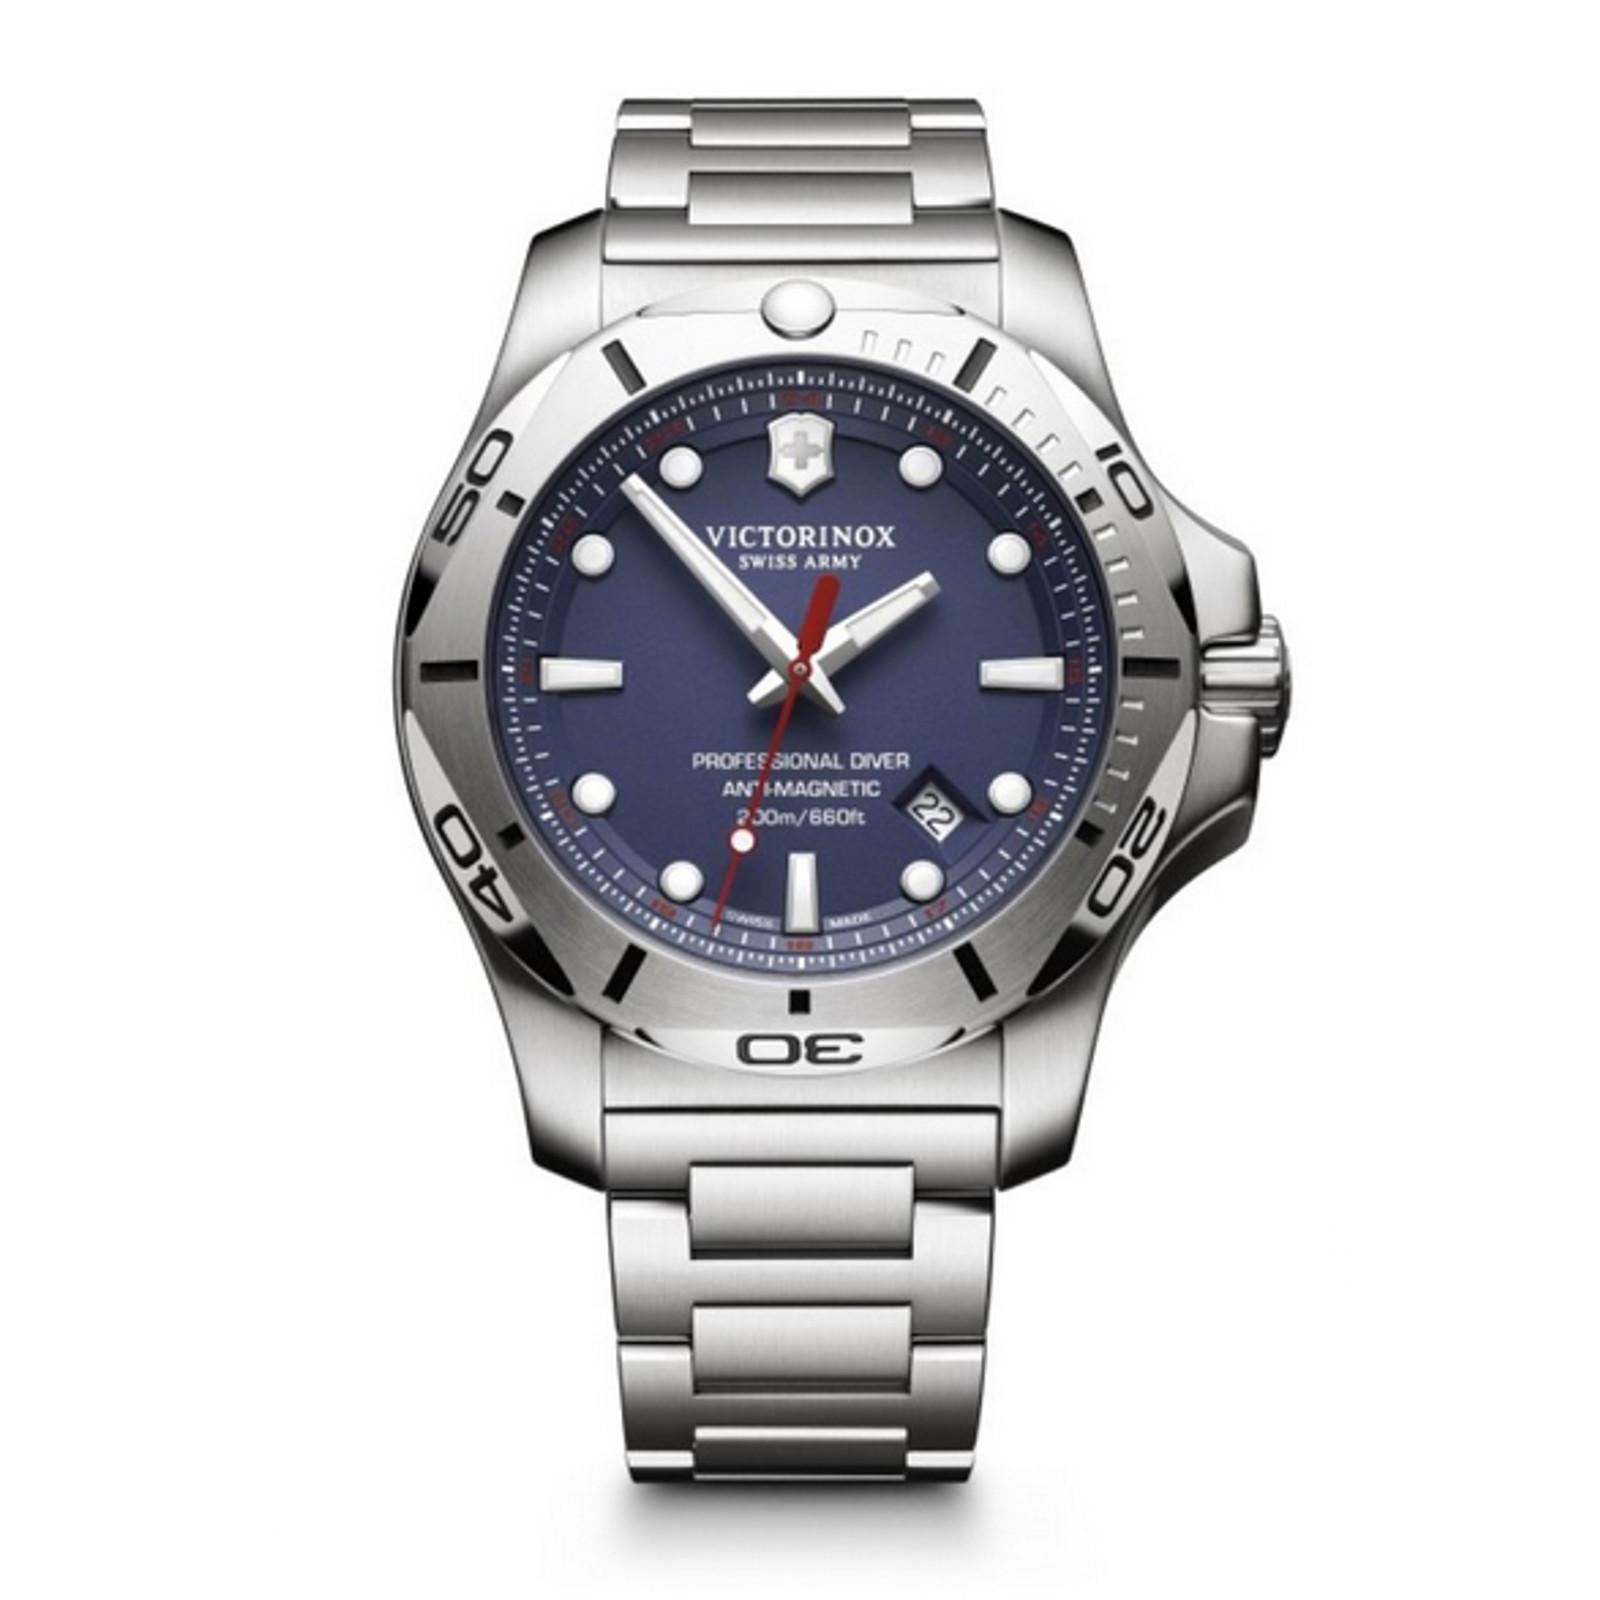 Victorinox INOX Professional Diver (241782)